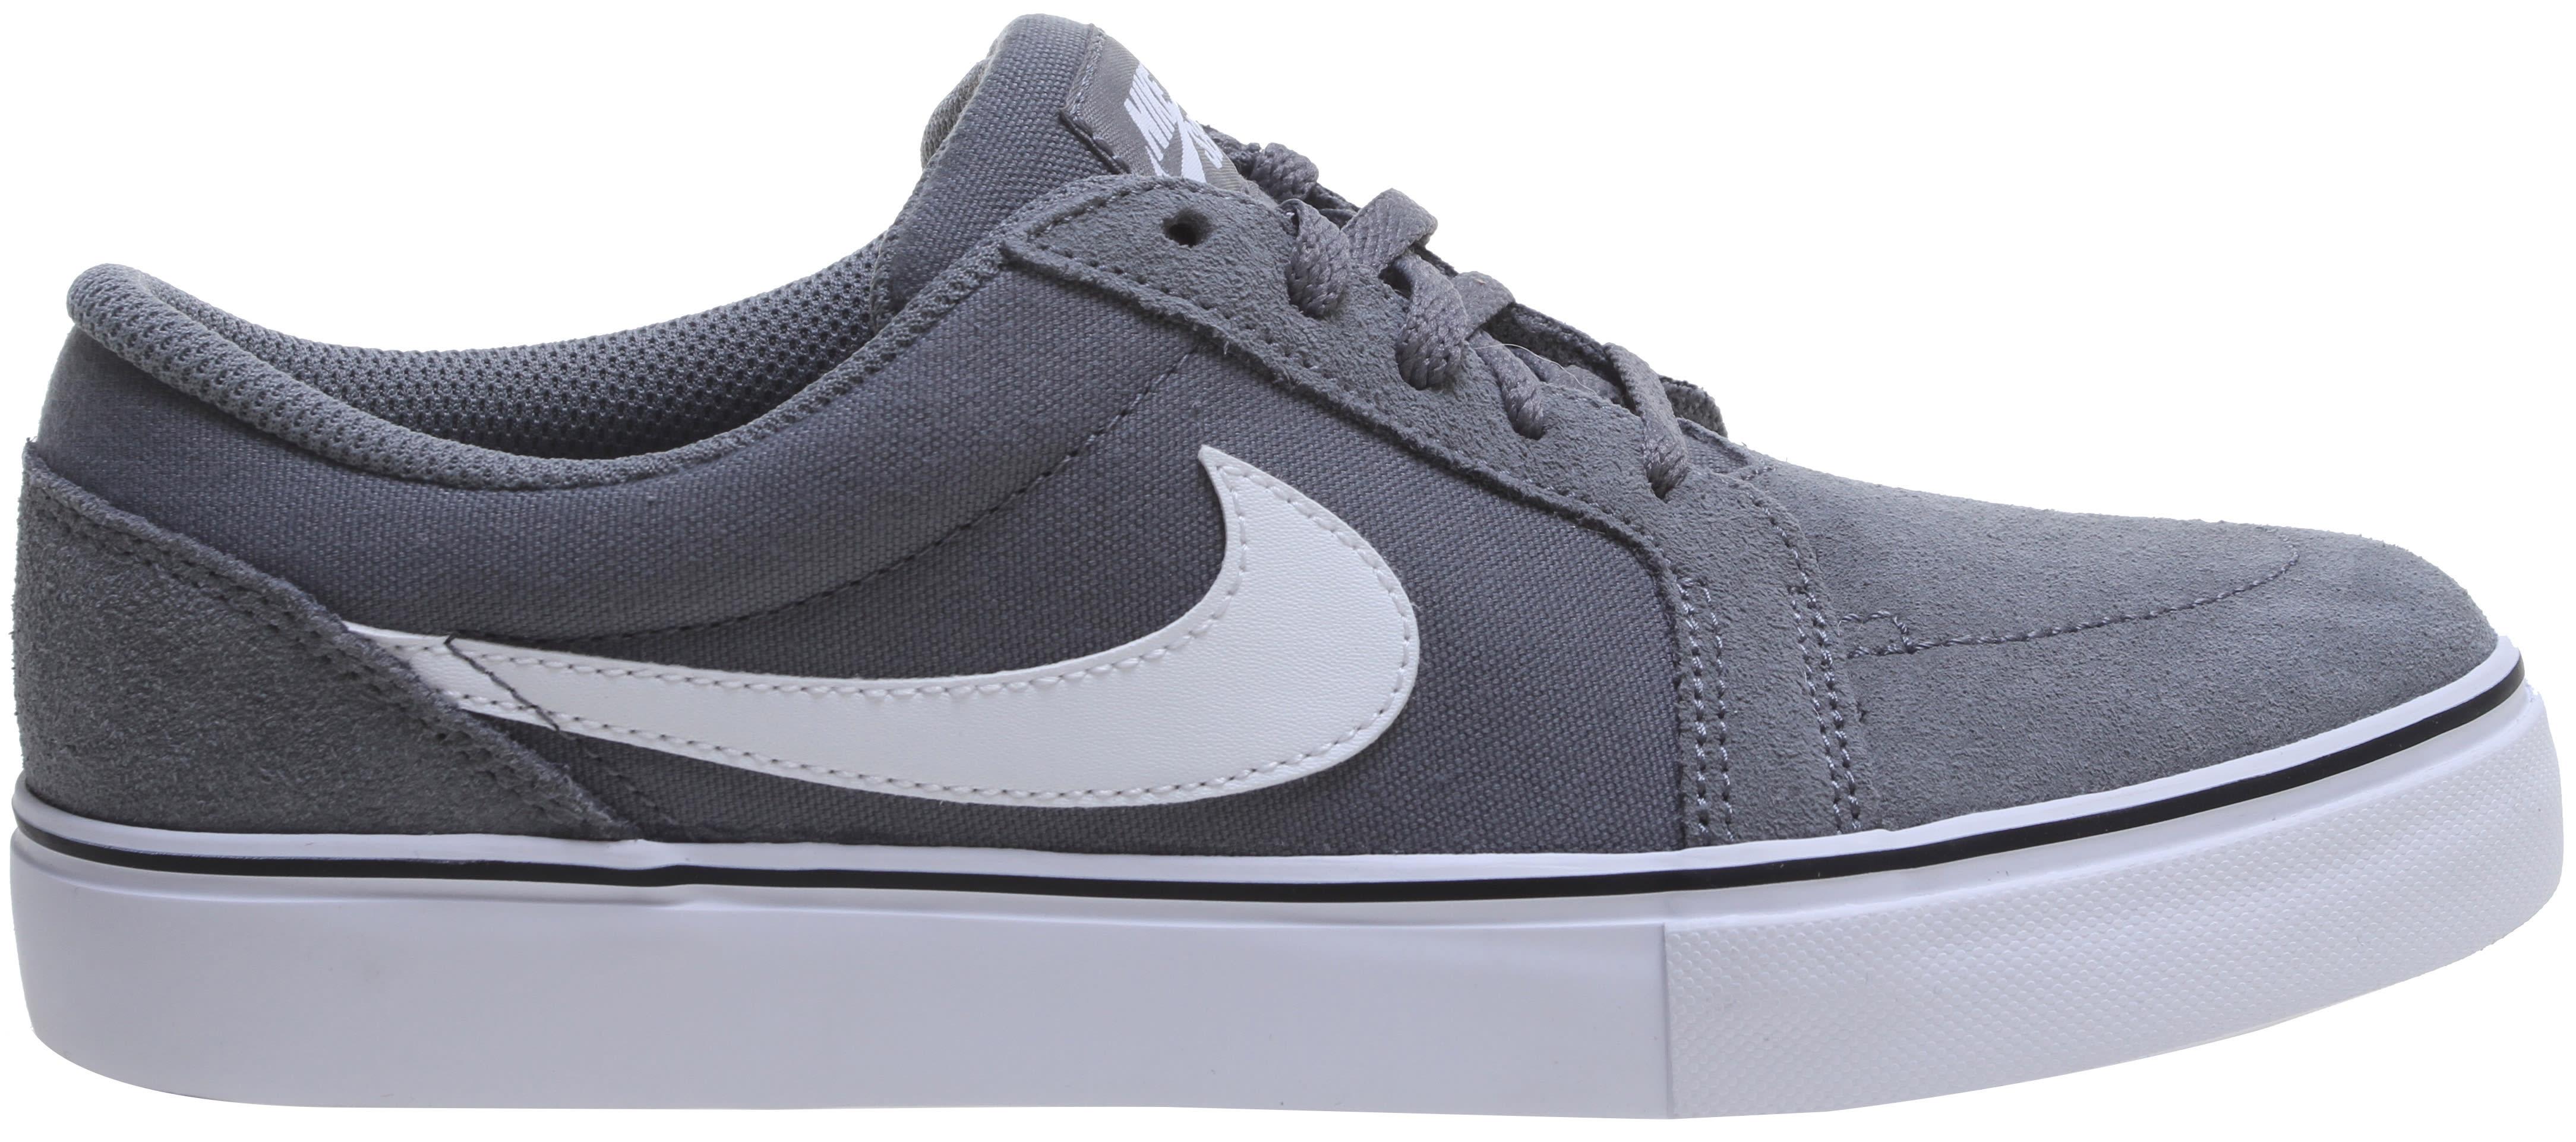 Nike Sb Satire Mens Shoes